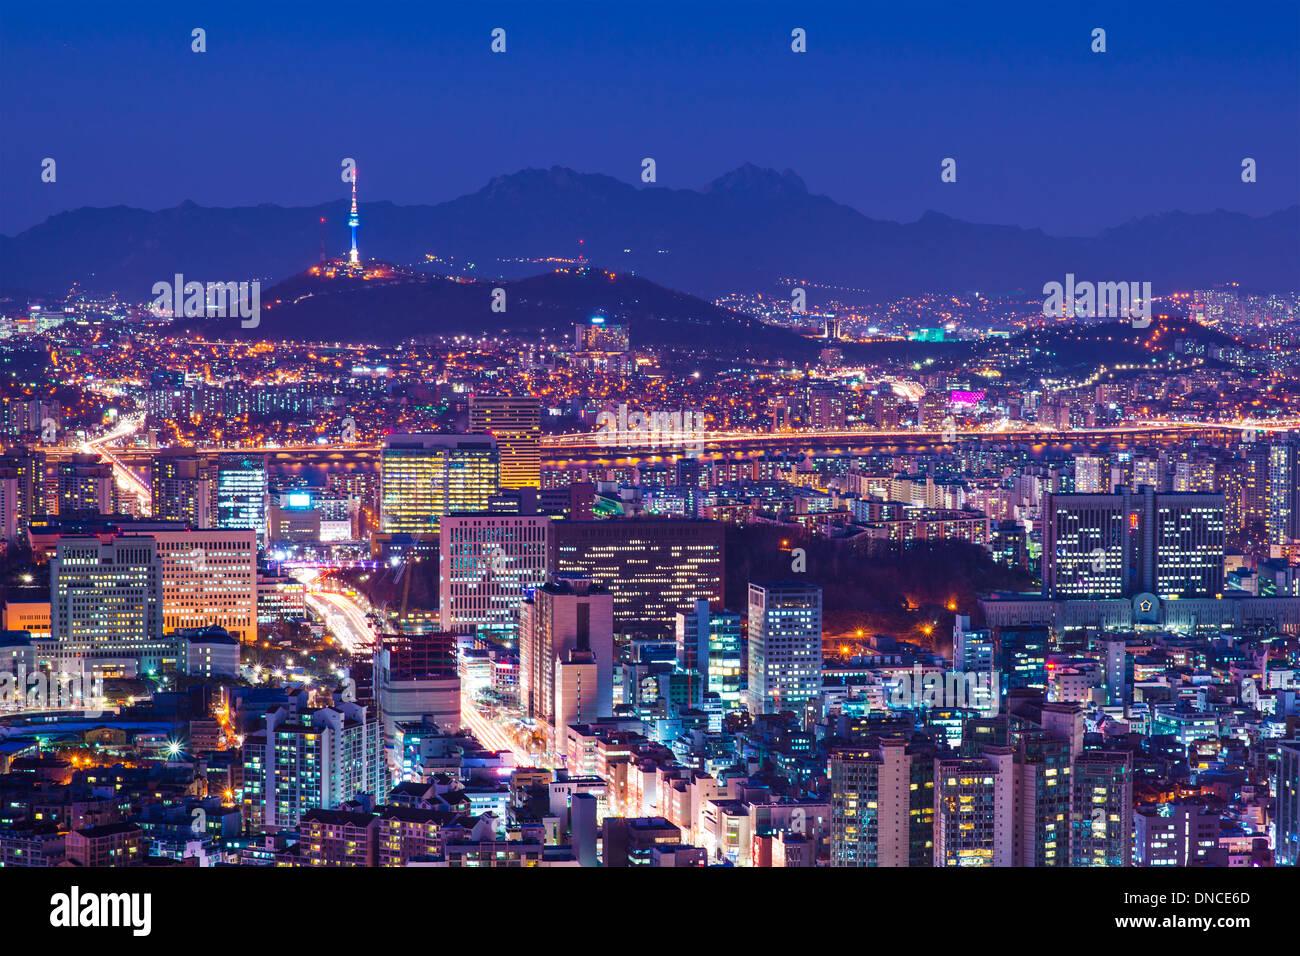 Seoul, South Korea city skyline nighttime skyline. - Stock Image